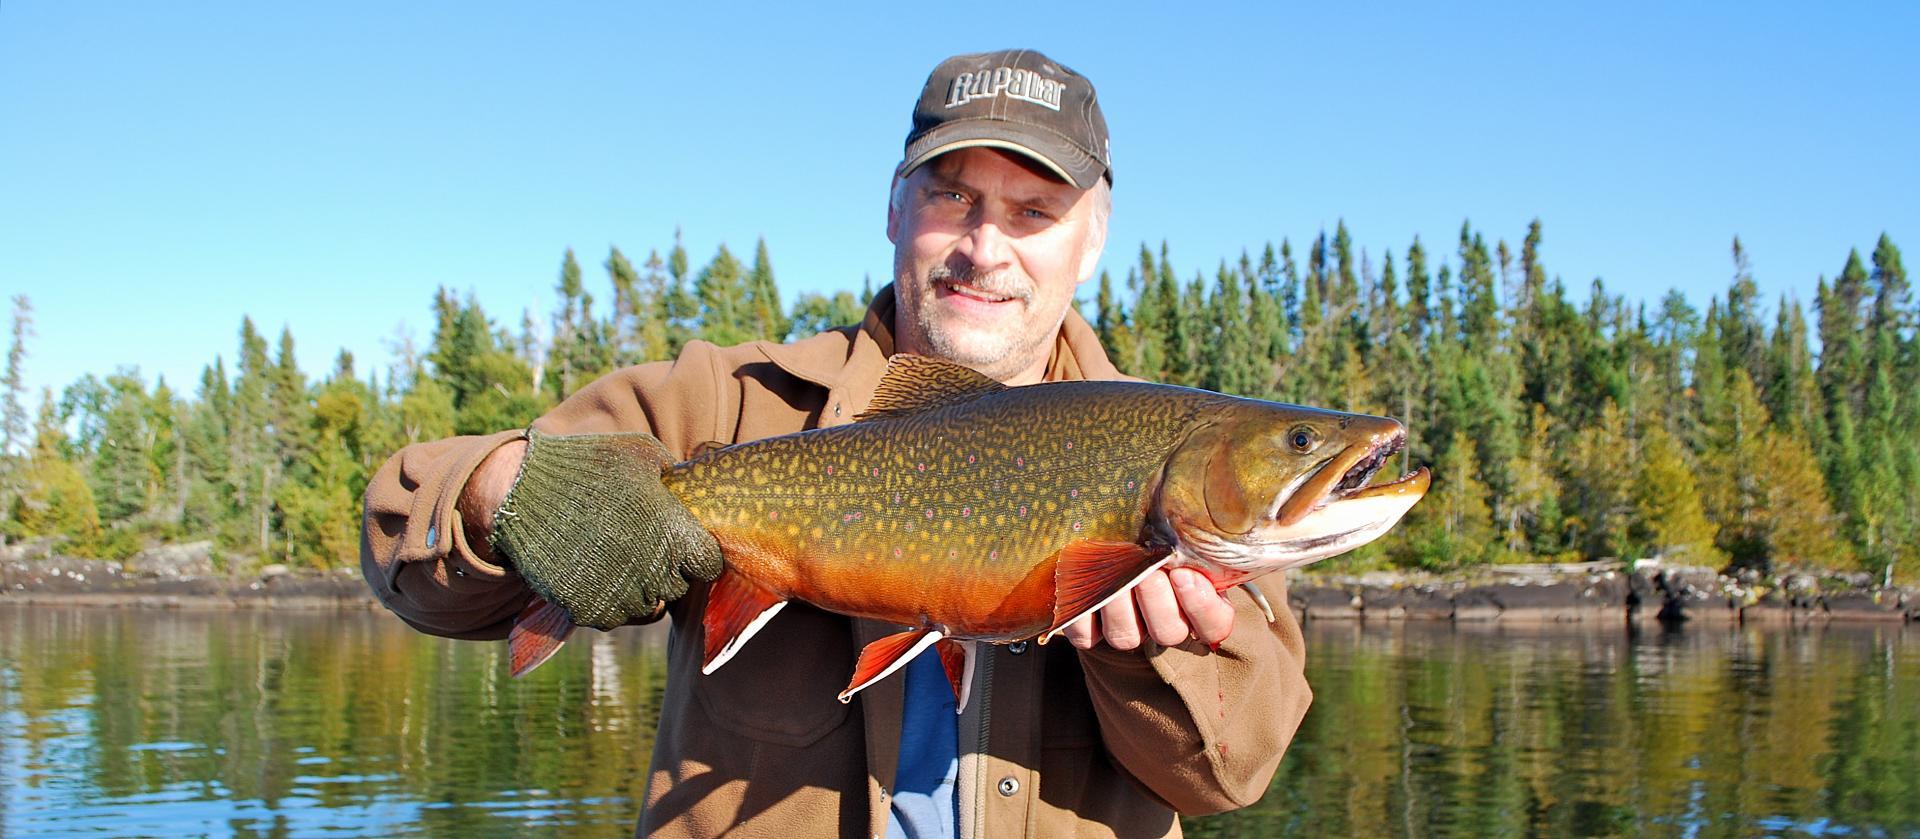 5 northern Ontario fishing hot spots